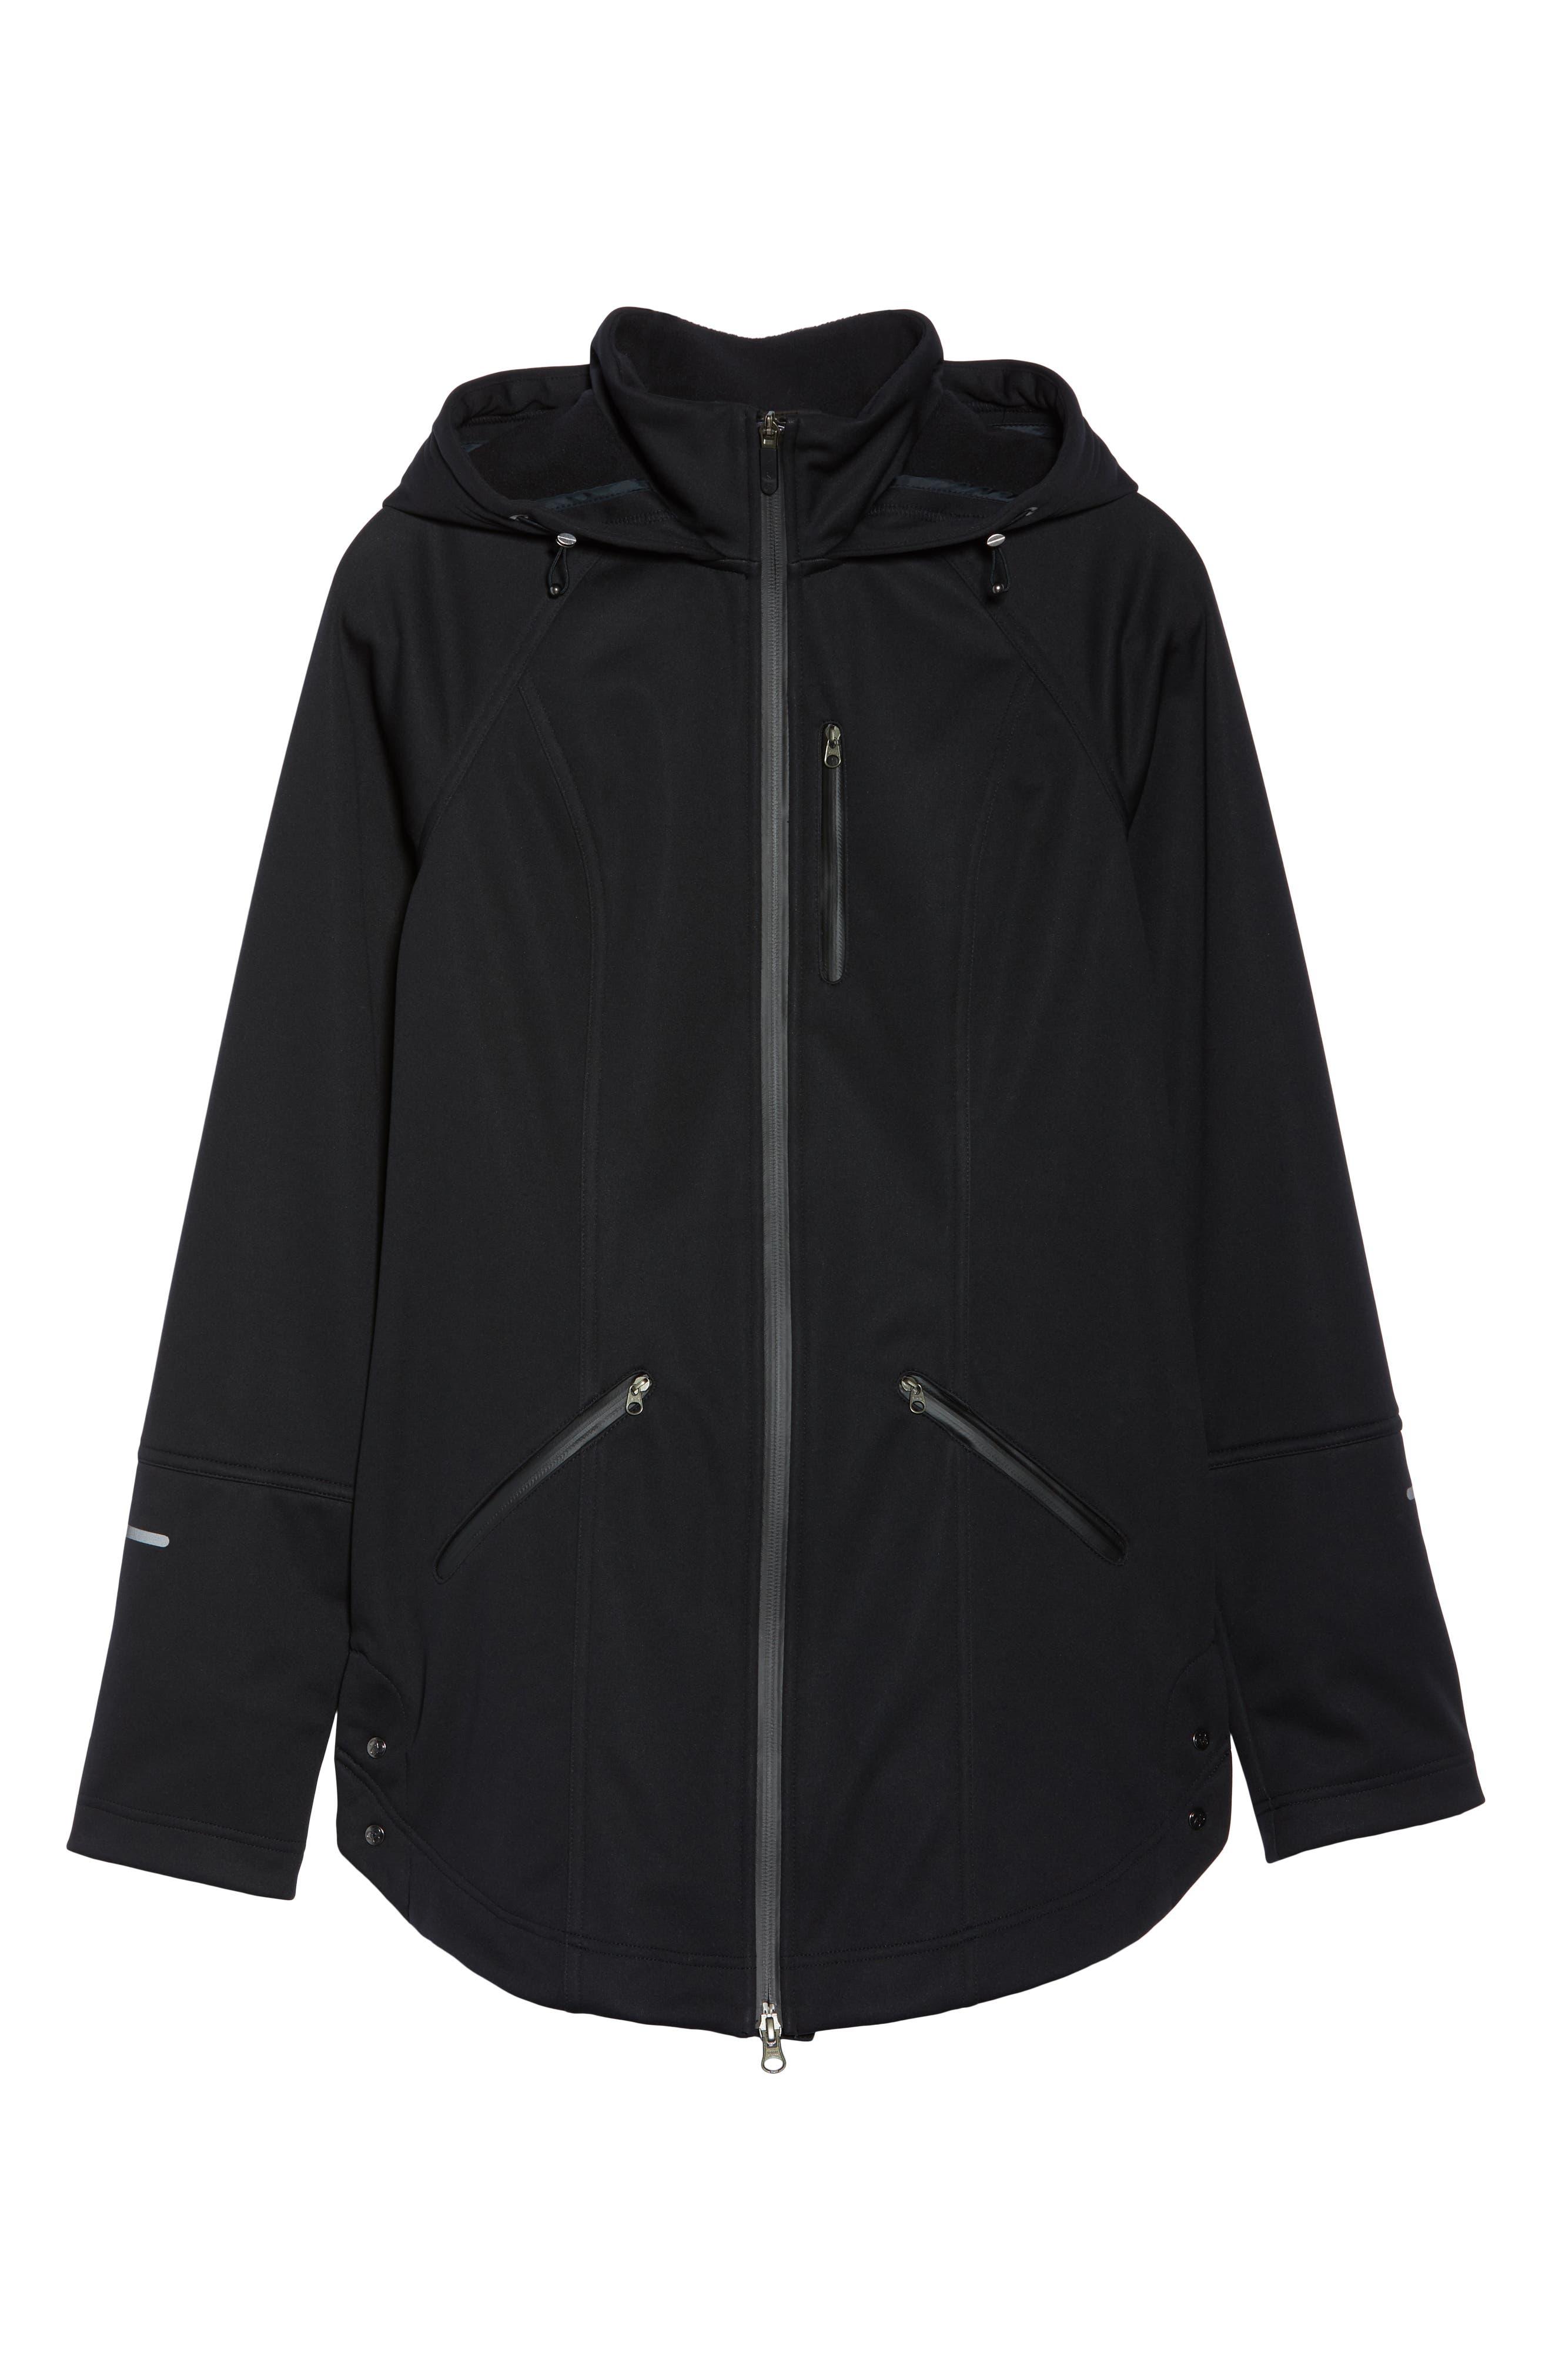 ZELLA, Aero Hooded Soft Shell Training Jacket, Alternate thumbnail 6, color, 001